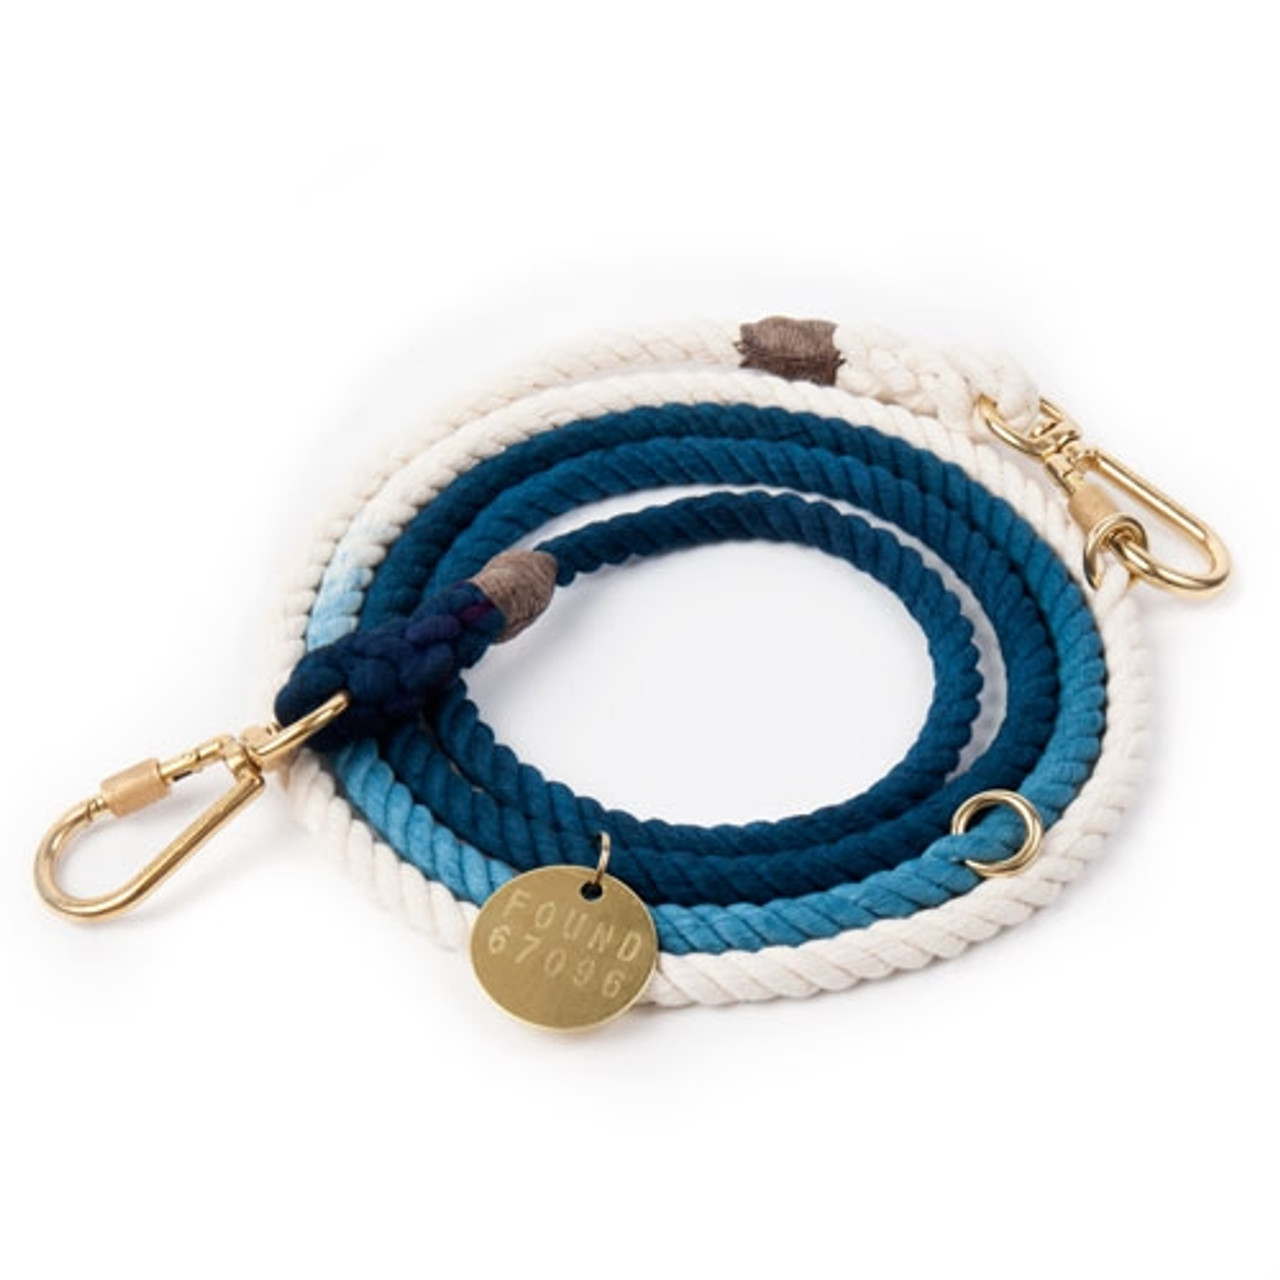 Adjustable Rope Dog Leash - Indigo Ombre